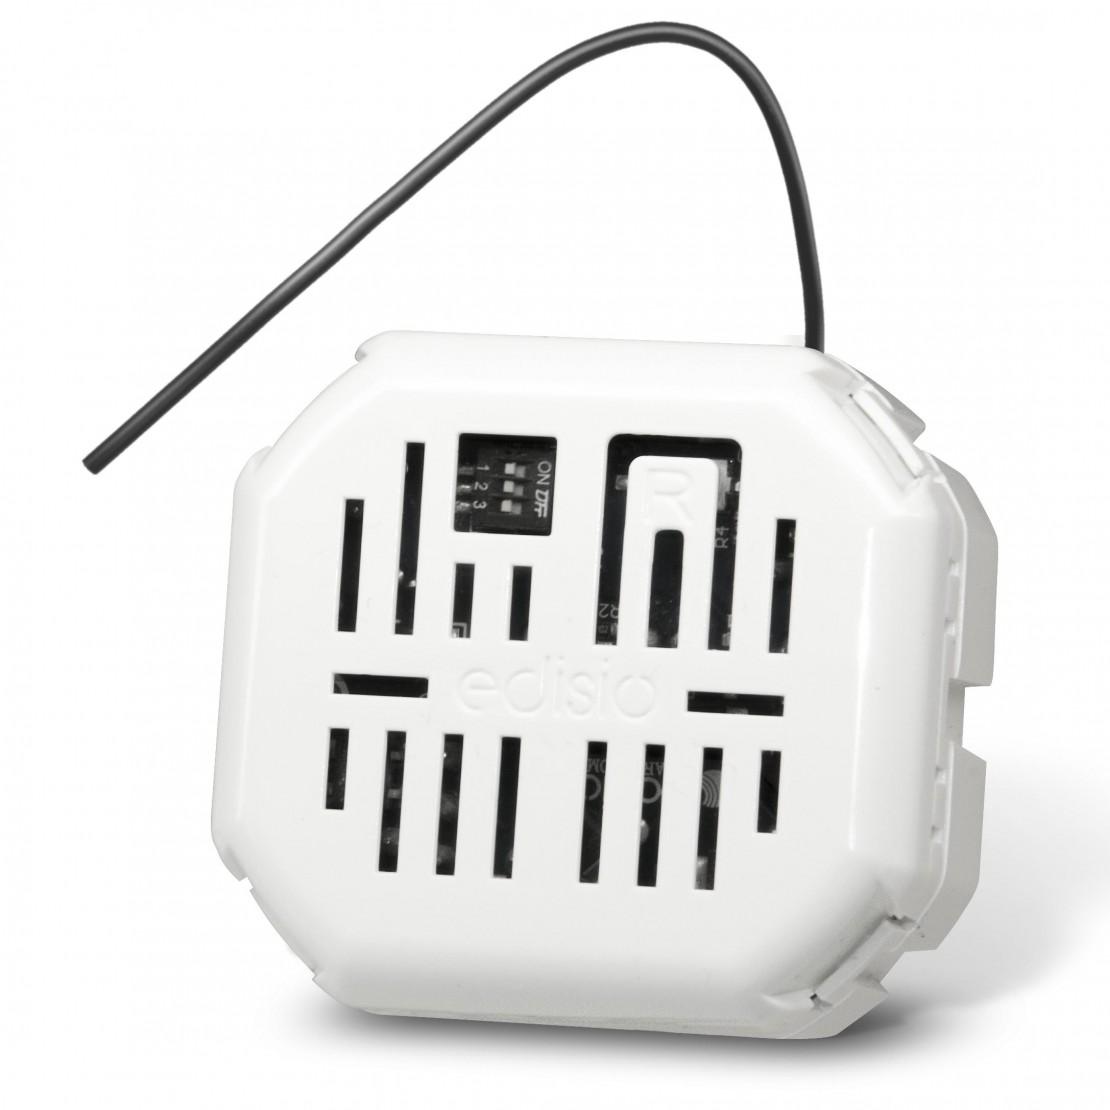 Microzendmodule, 2 kanalen, 230V